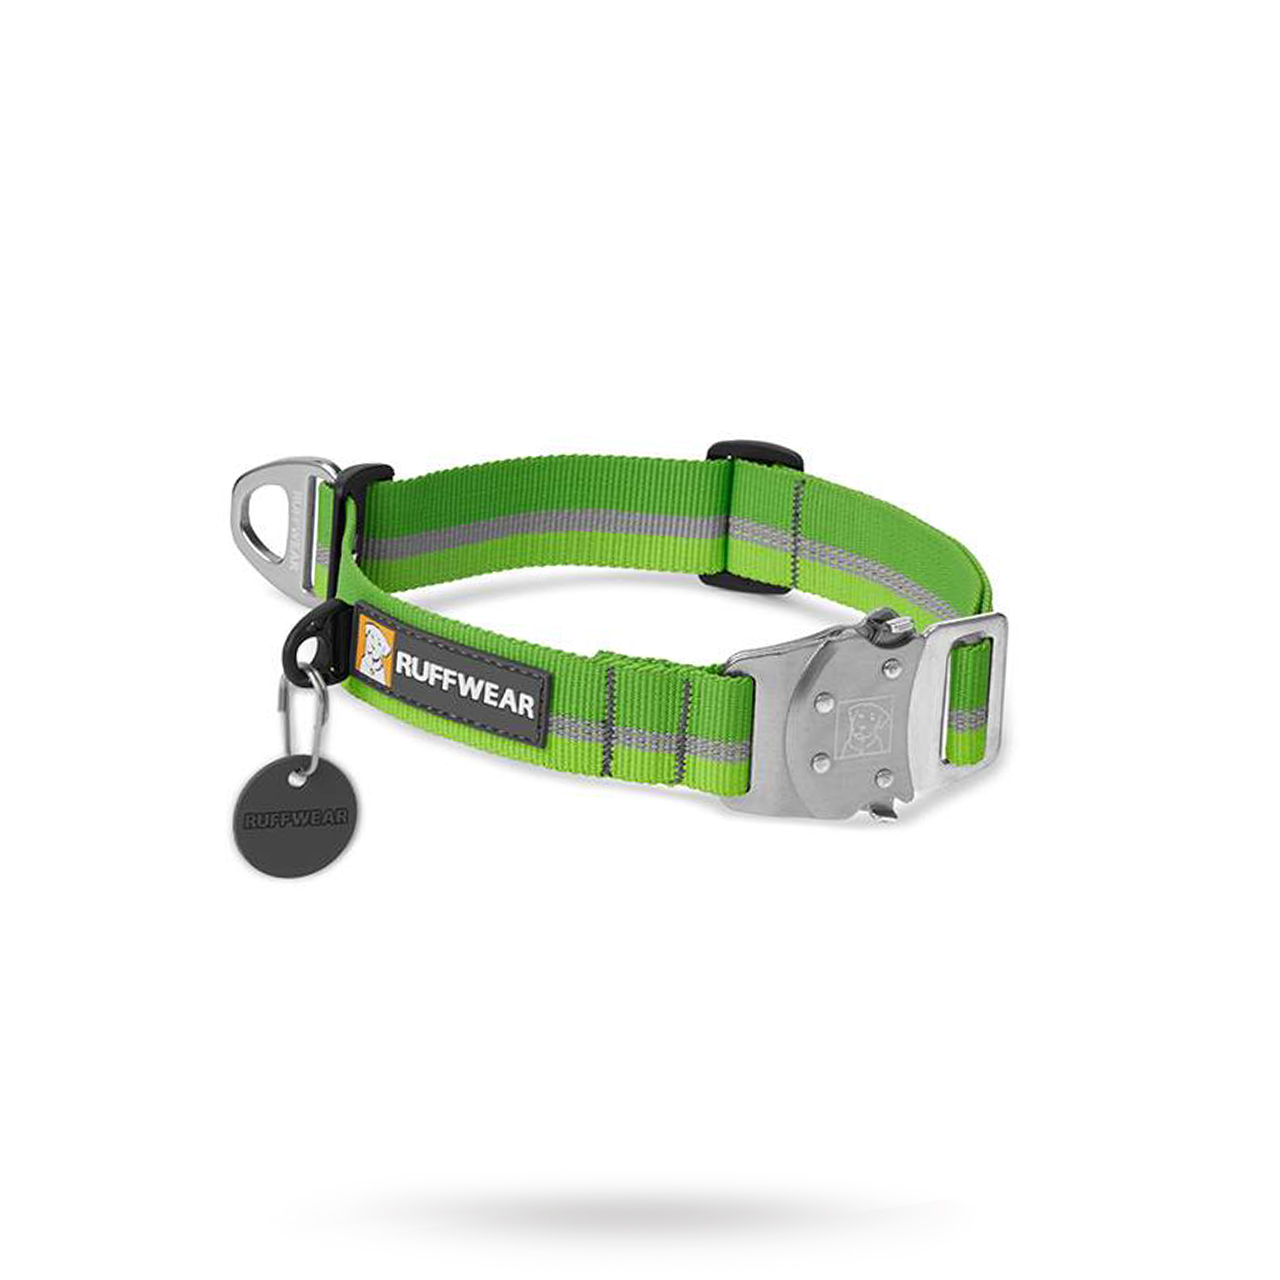 Top Rope Justerbart Halsband - Grön